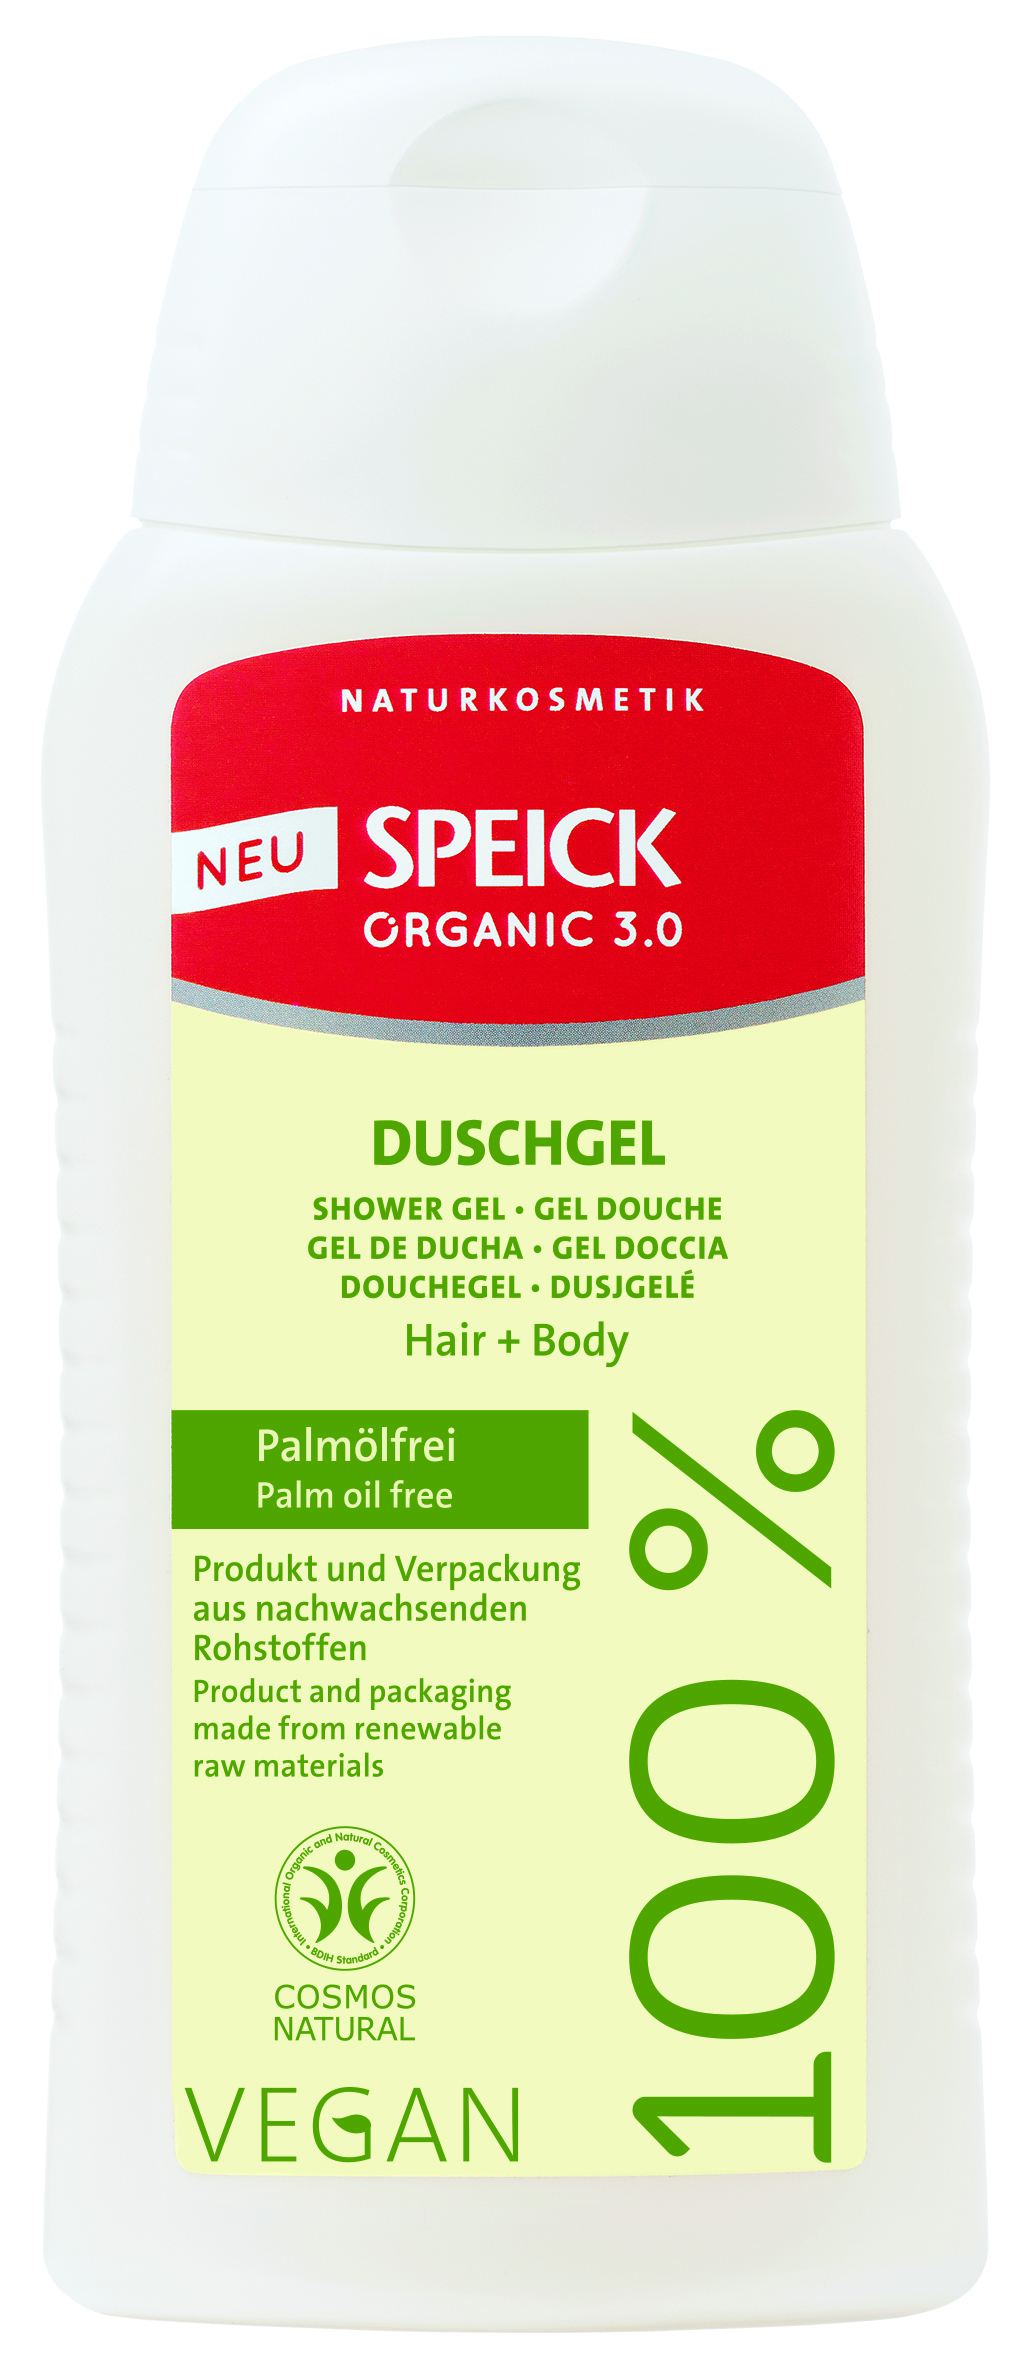 speick_o-duschgel_300dpi